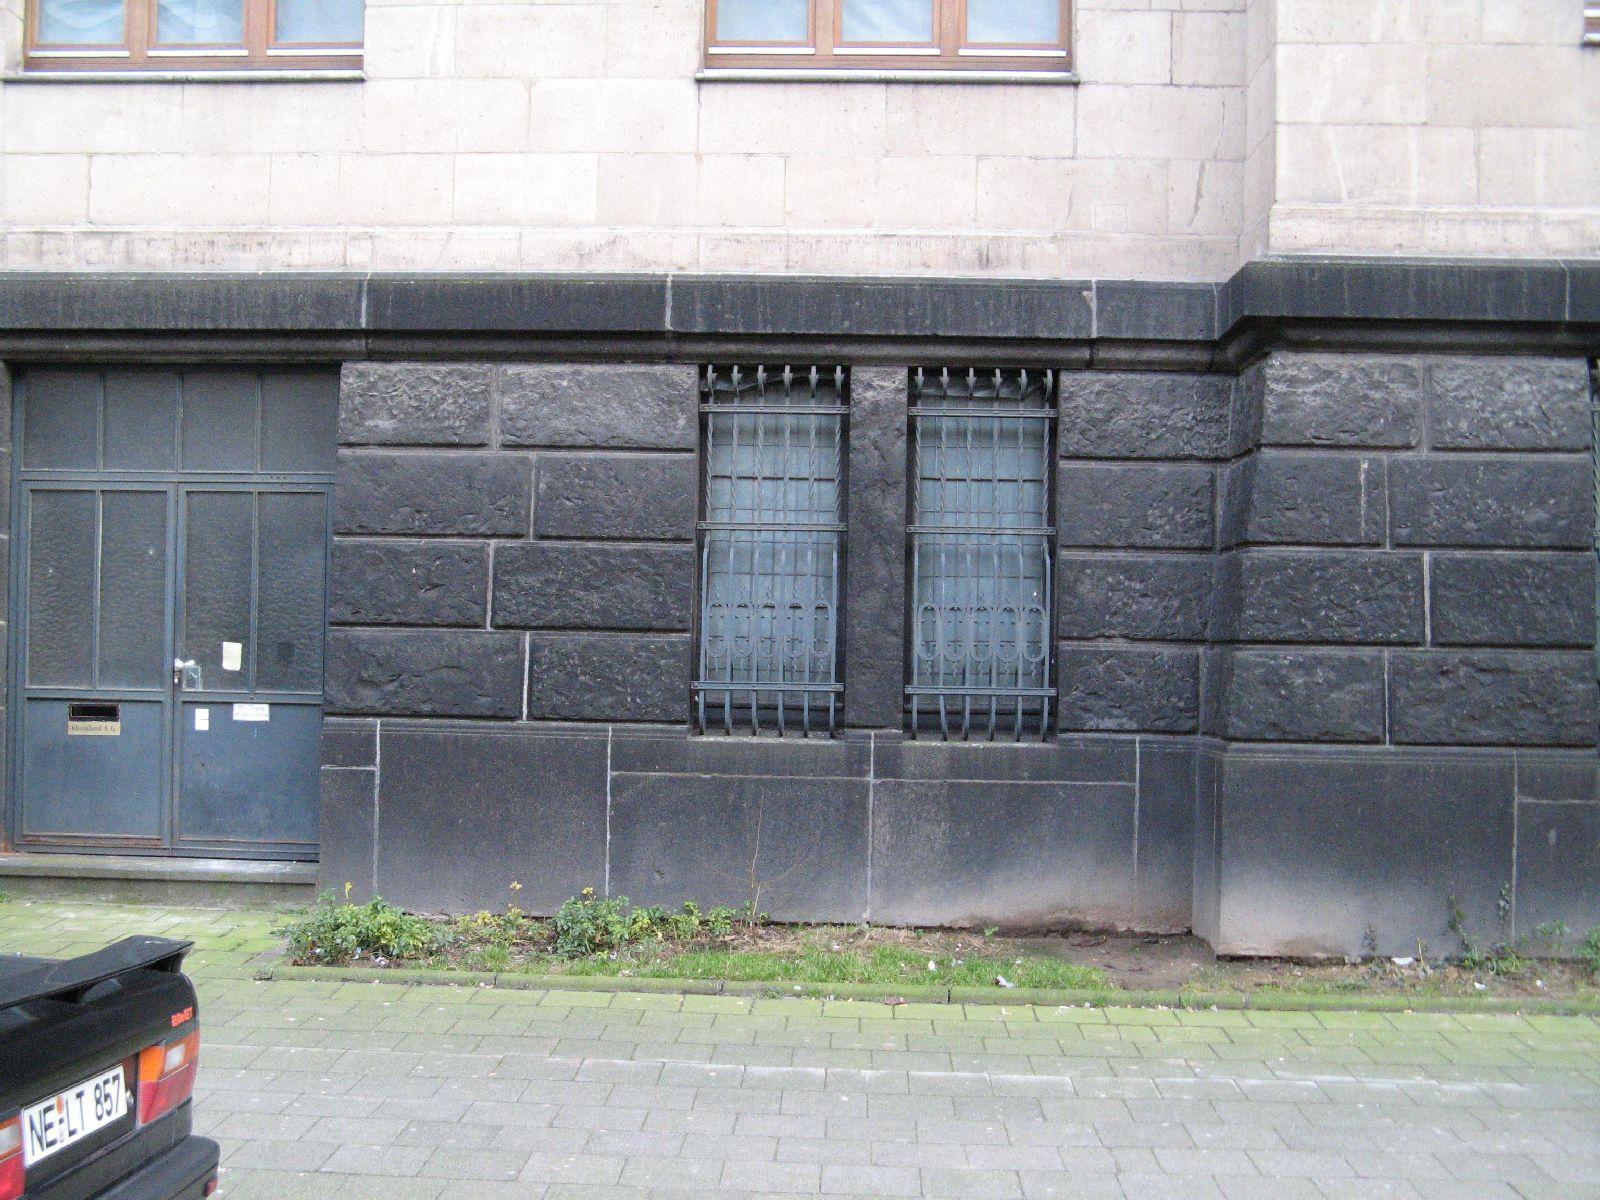 Gebaeude-Architektur_Textur_B_3893